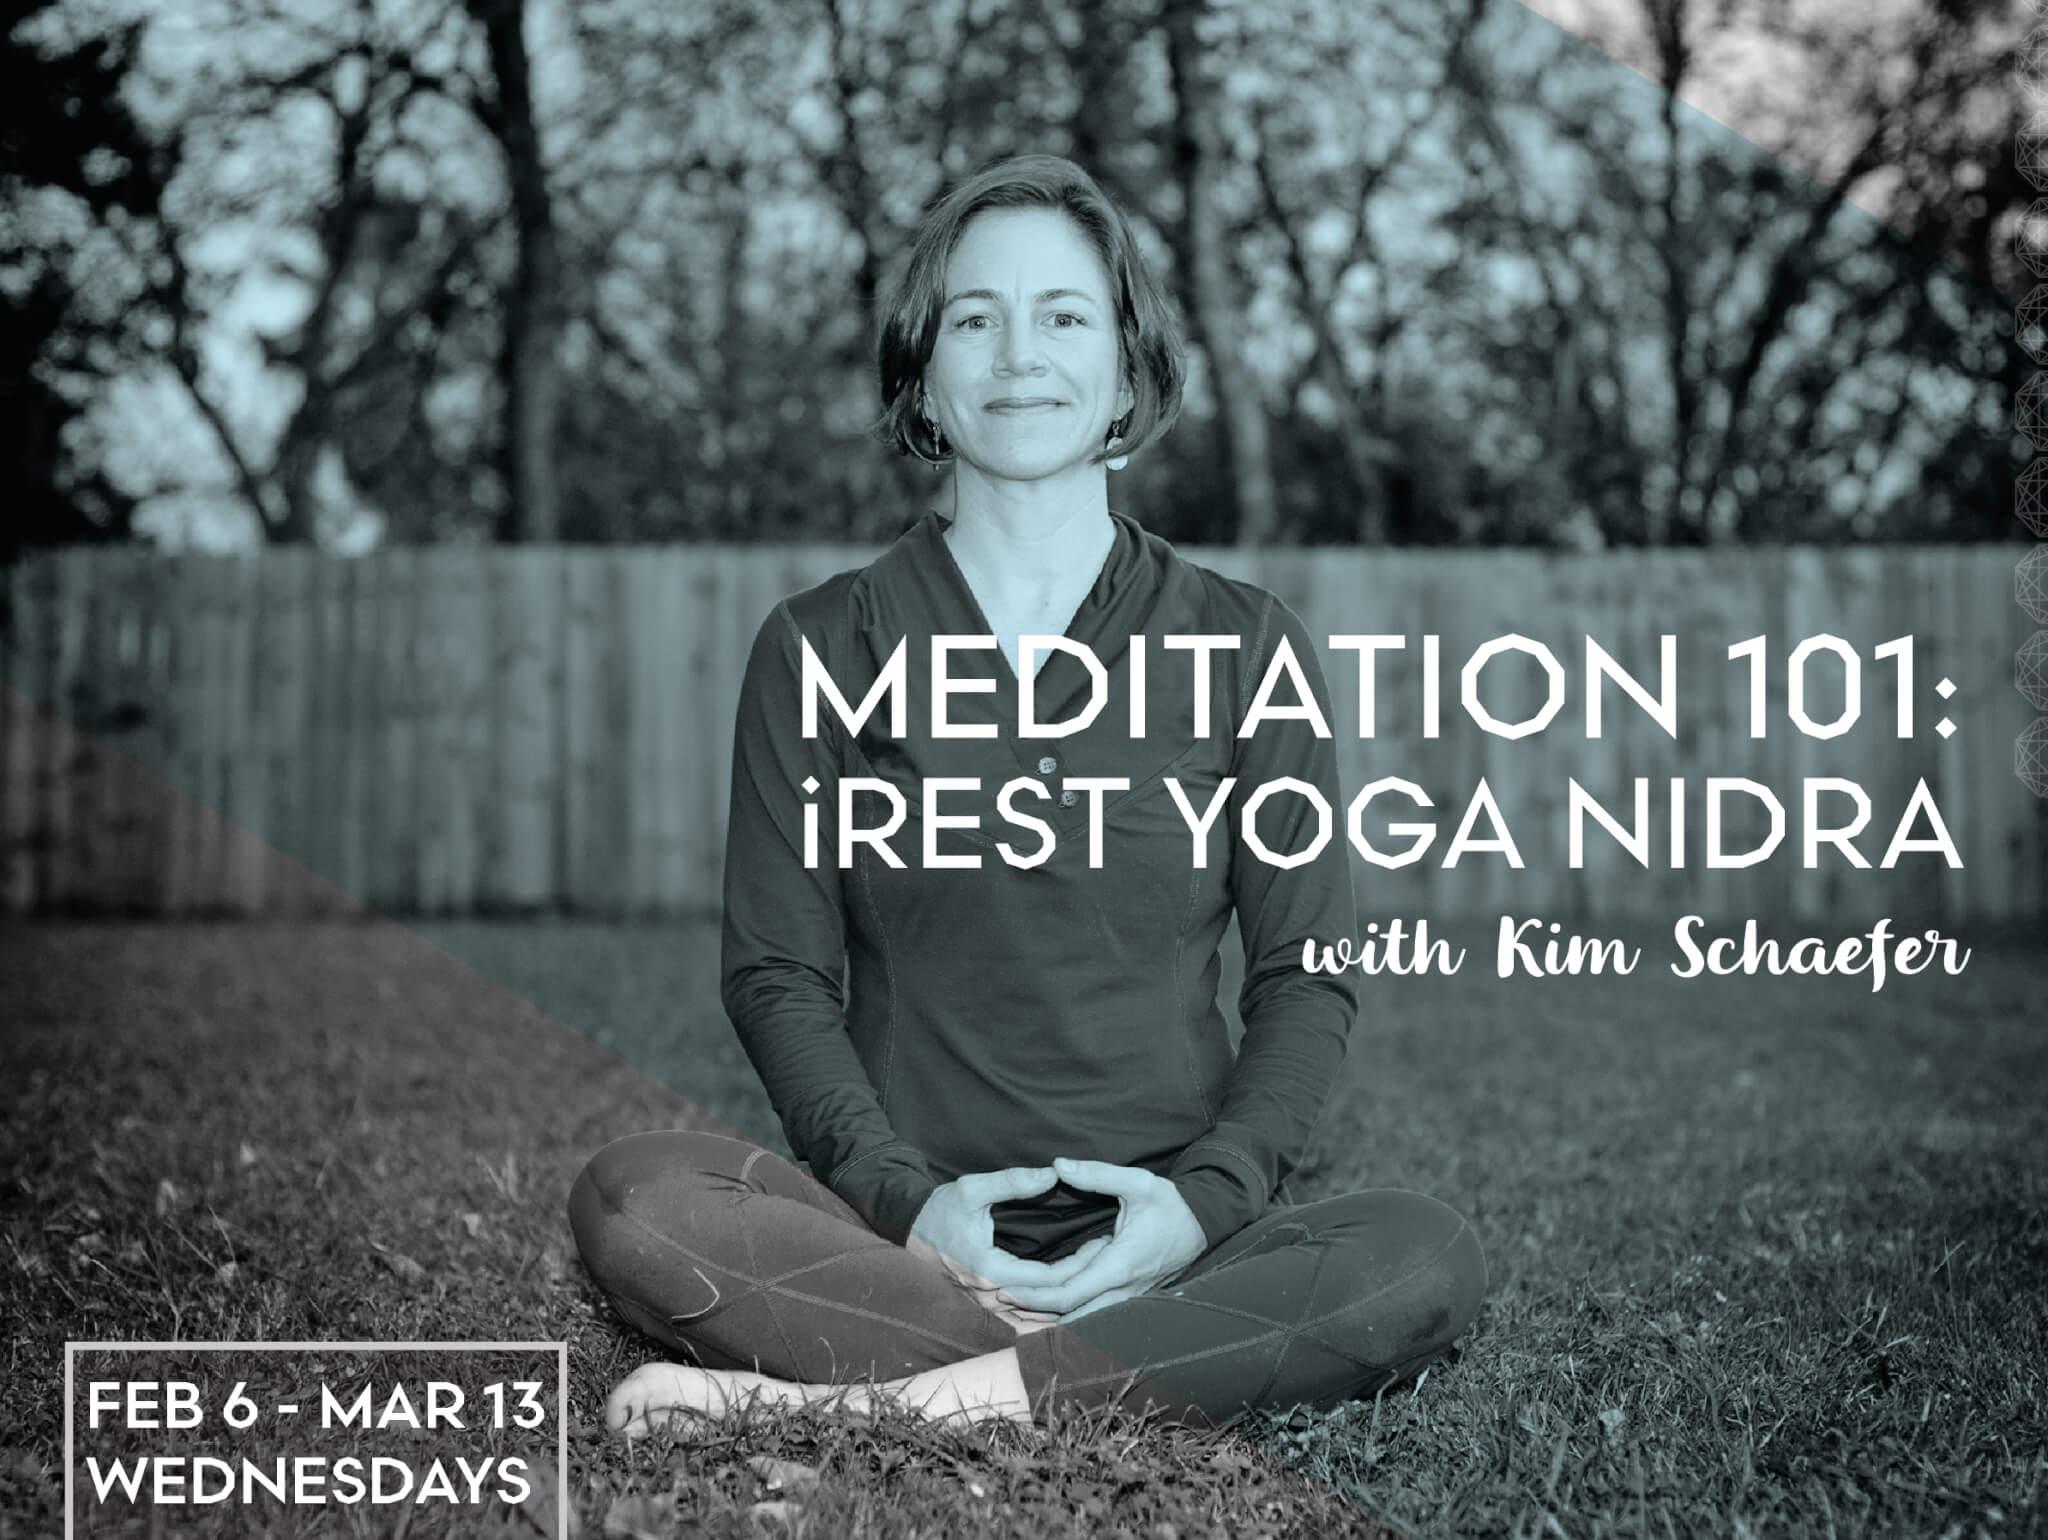 Meditation 101: iRest Yoga Nidra